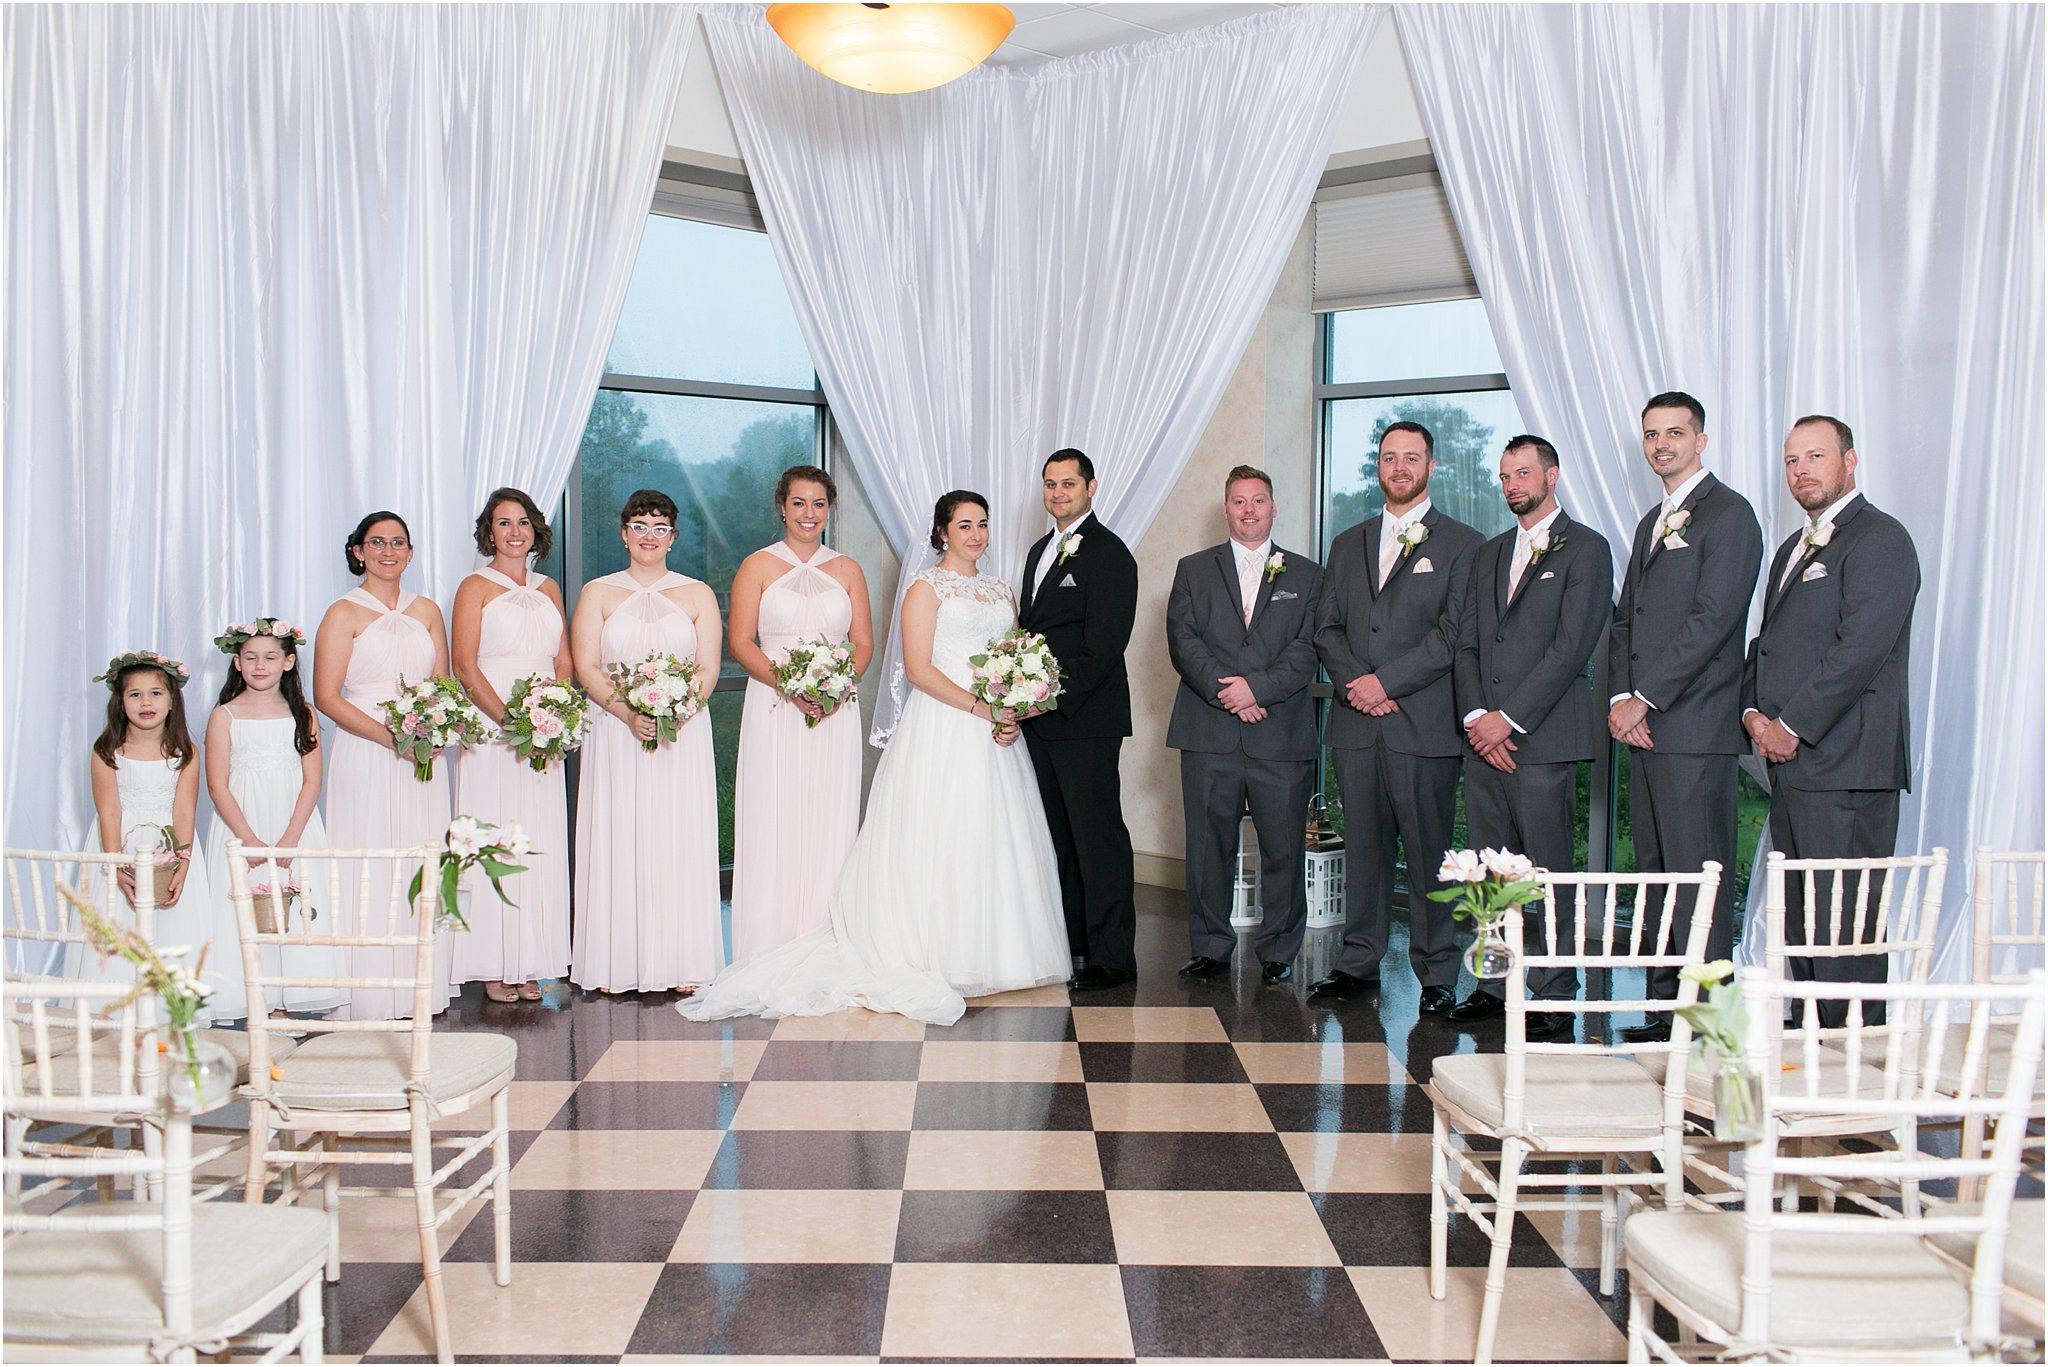 jessica_ryan_photography_virginia_wedding_photographer_wedding_hurricane_norfolk_botanical_gardens_hurricane_matthew_wedding_3577